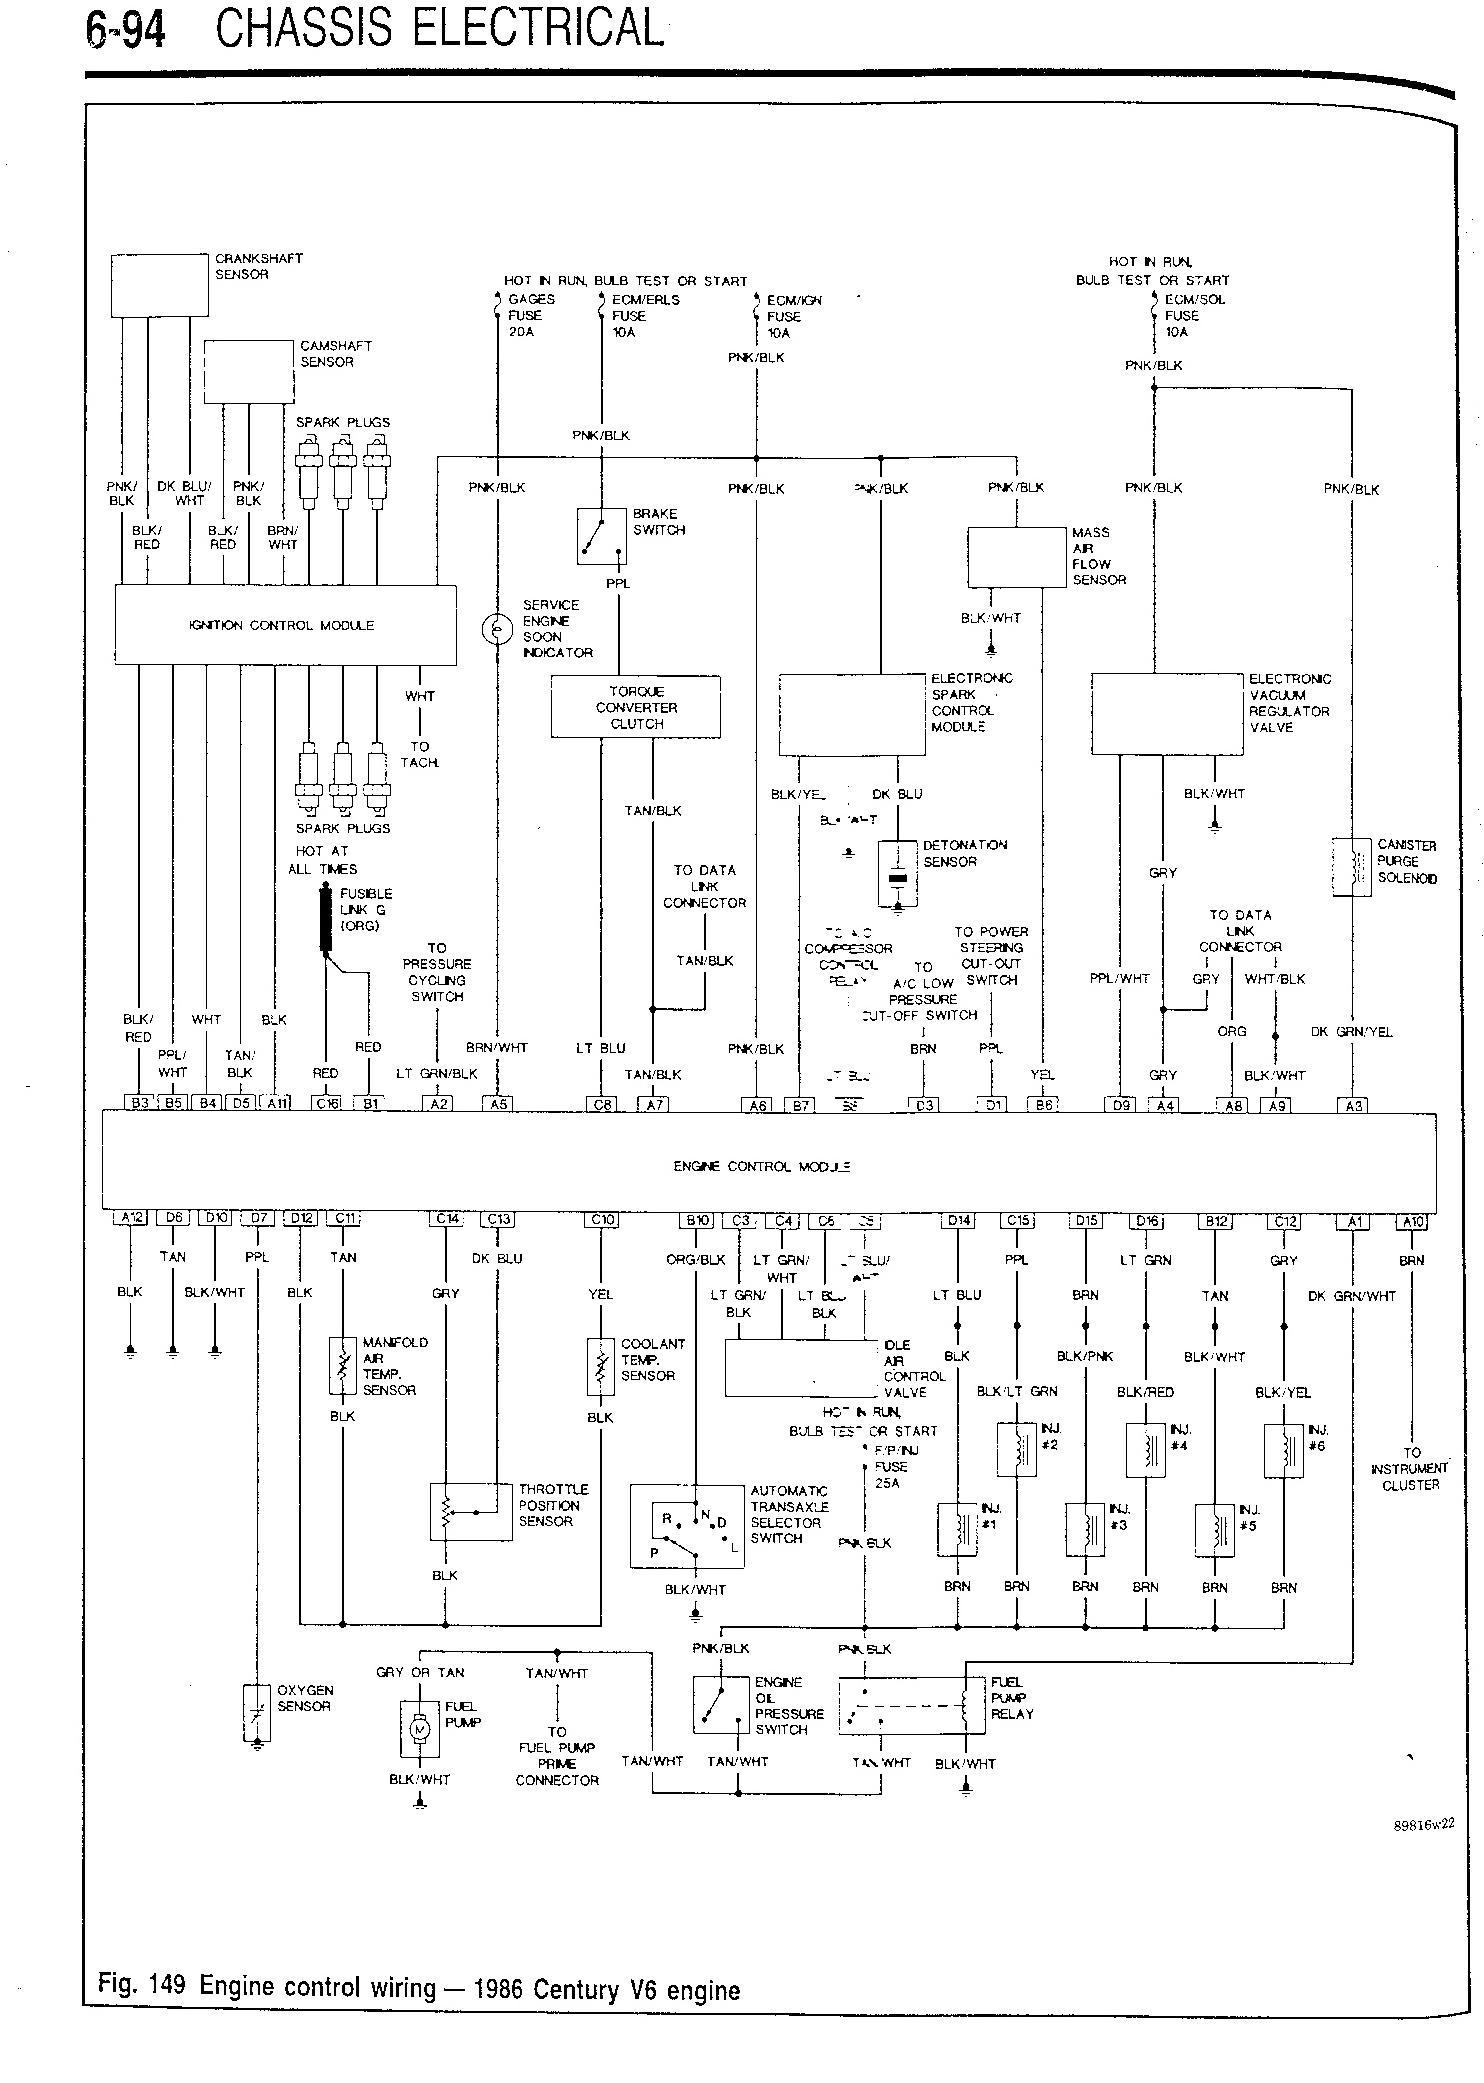 Index of dave 77 Hatchback   Vega   V6    Vega   Hot Air Turbo